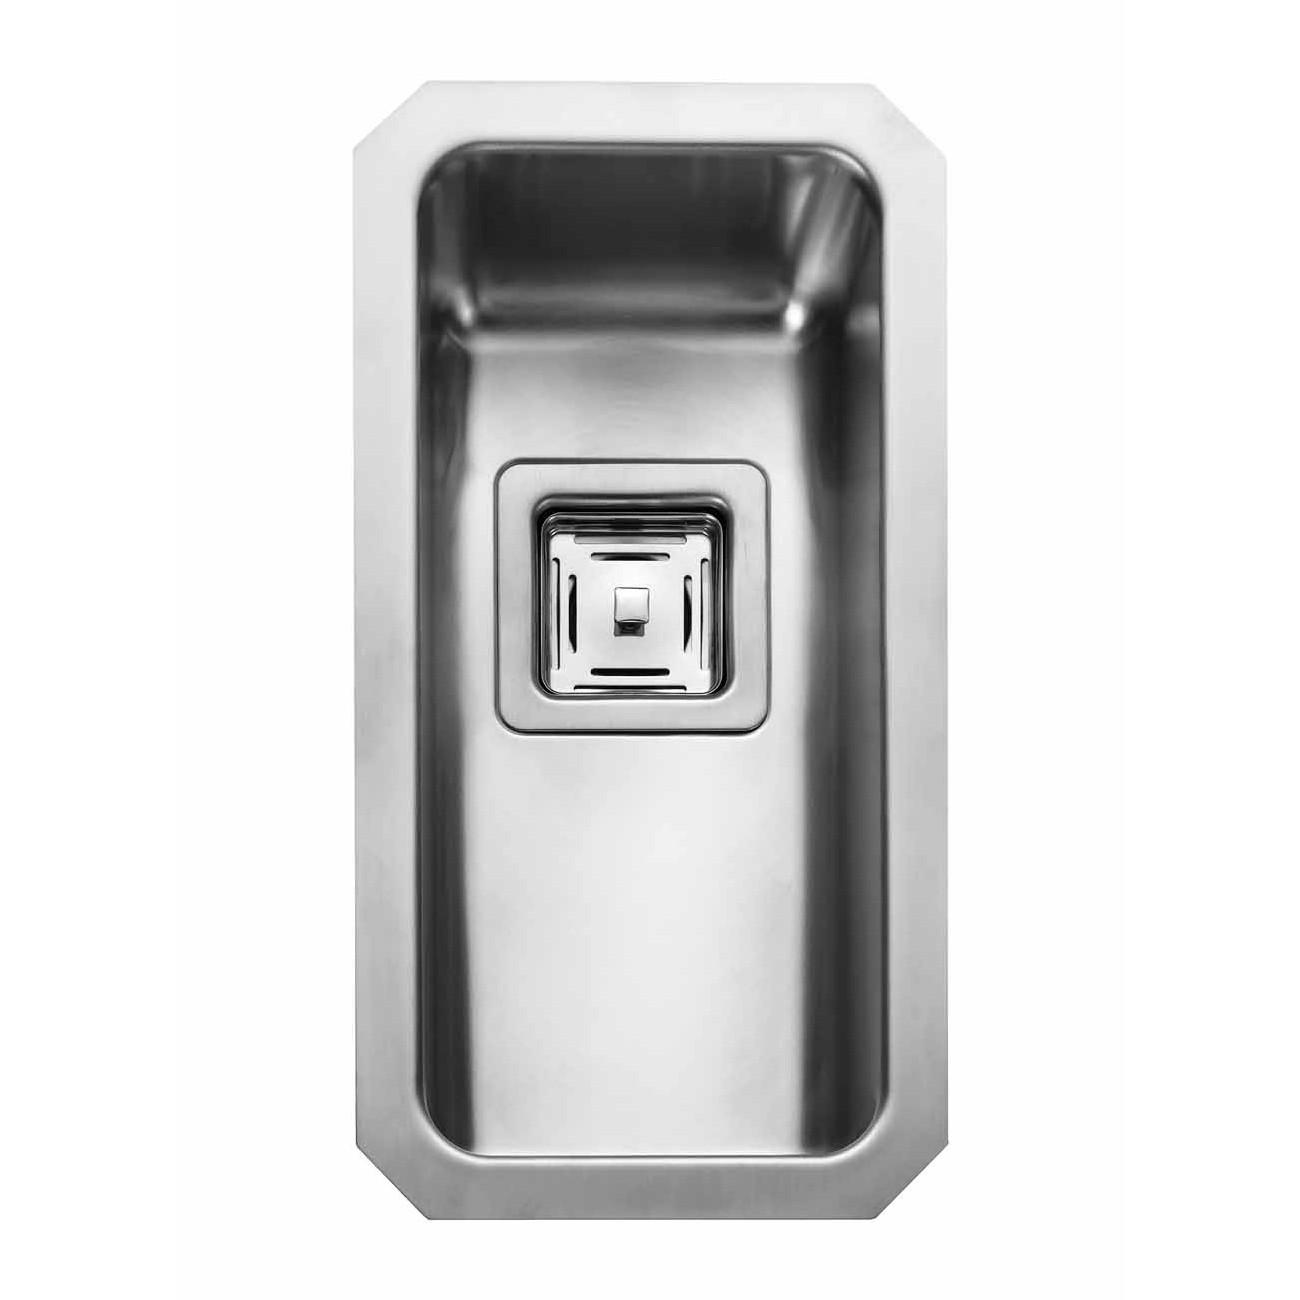 Rangemaster Quad QUB18/ Single Bowl Undermount Sink